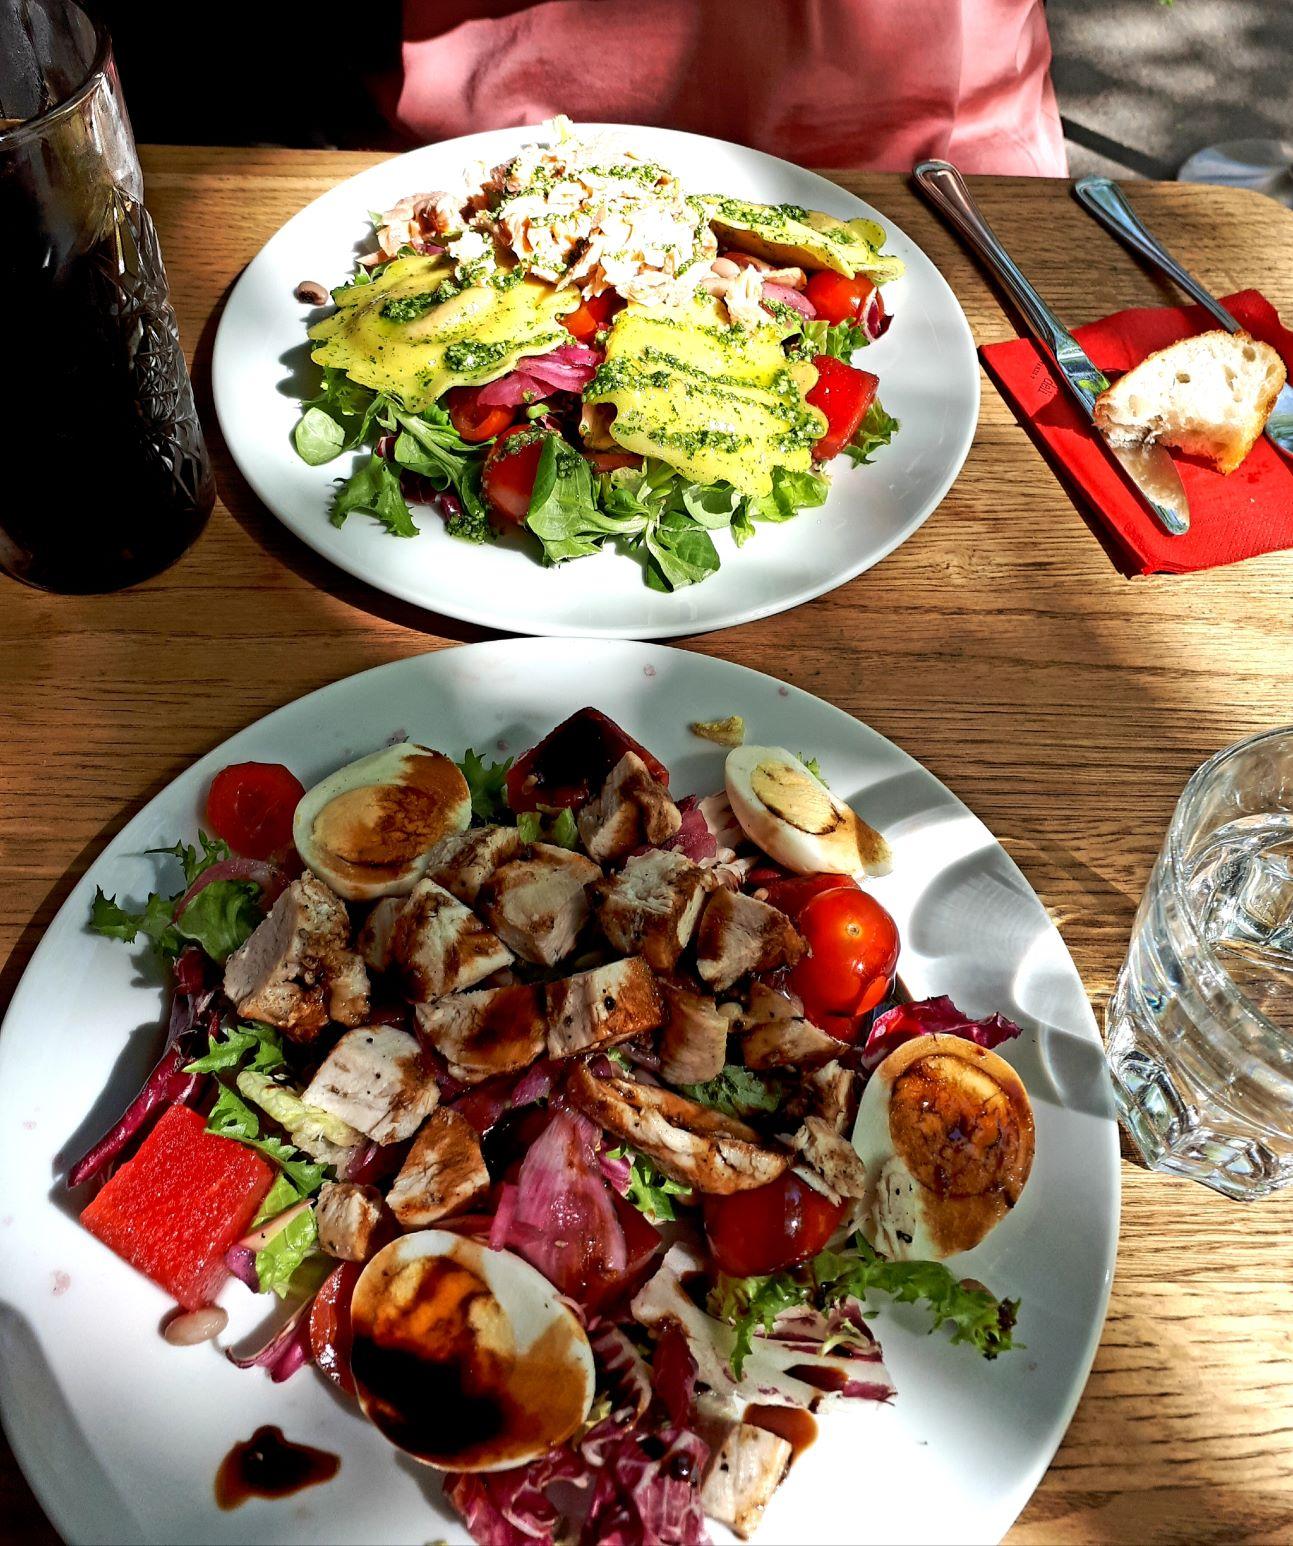 Helsingin parhaat salaatit ja lounas terassilla